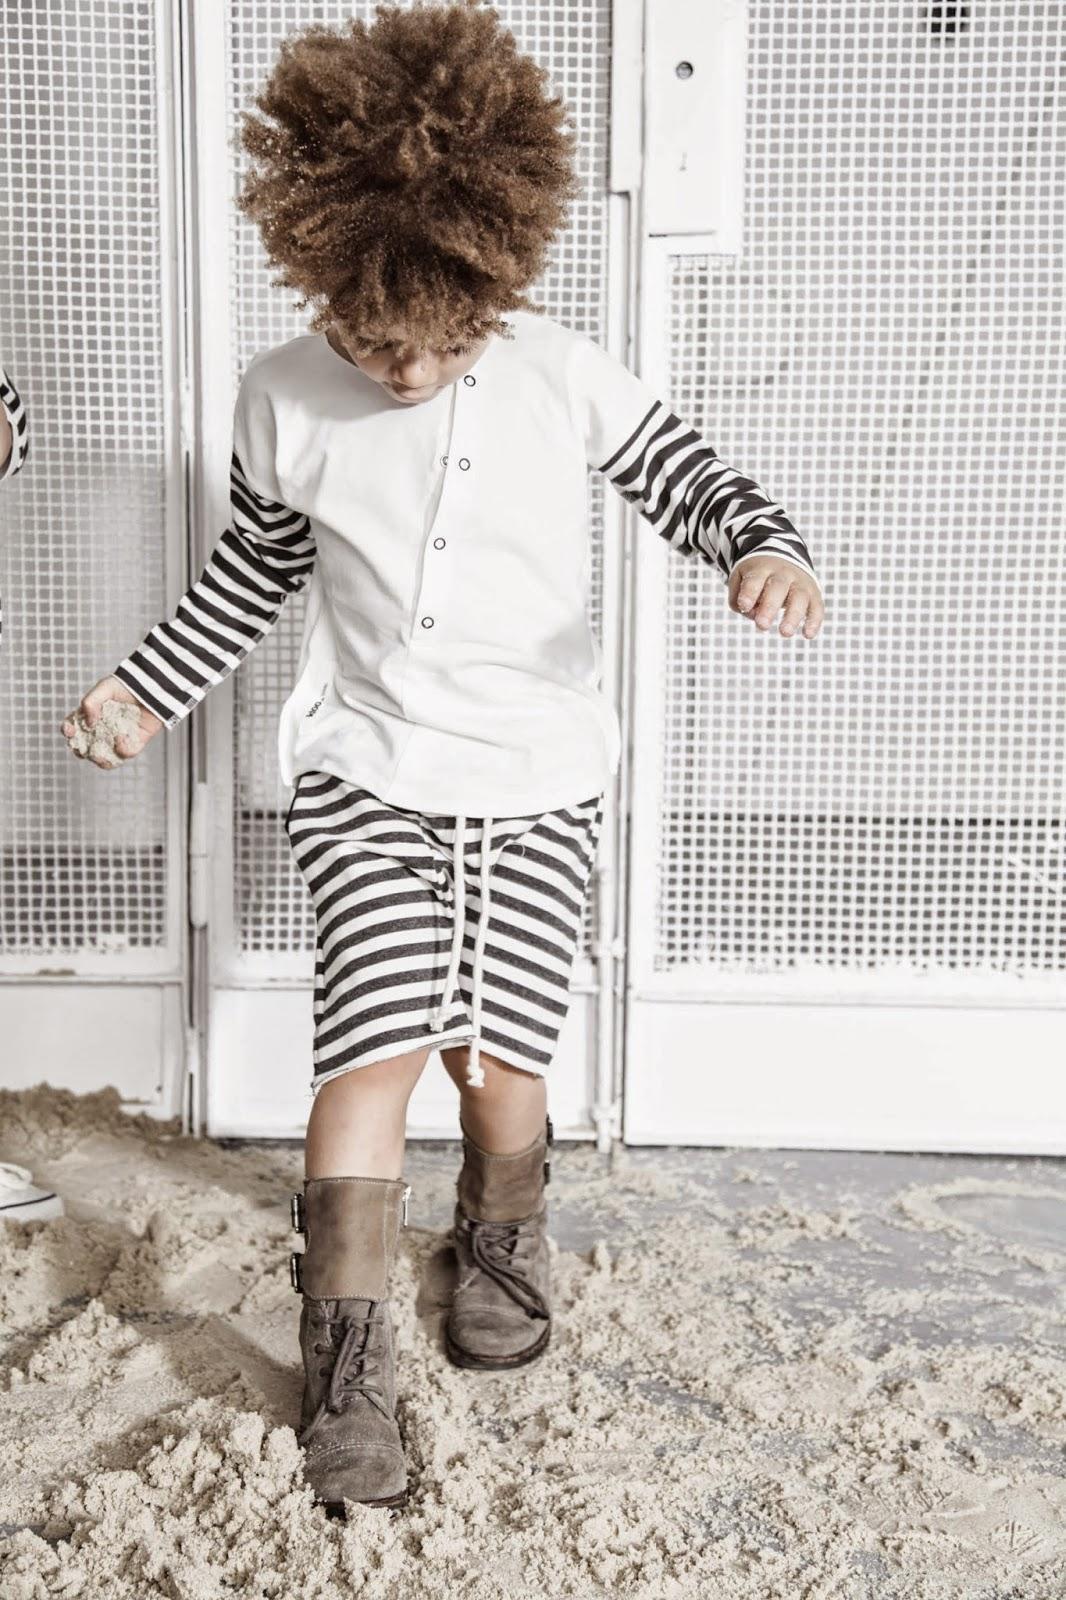 Kloo by Booso - Polish kids fashion spring-summer 2015 - basic stripes